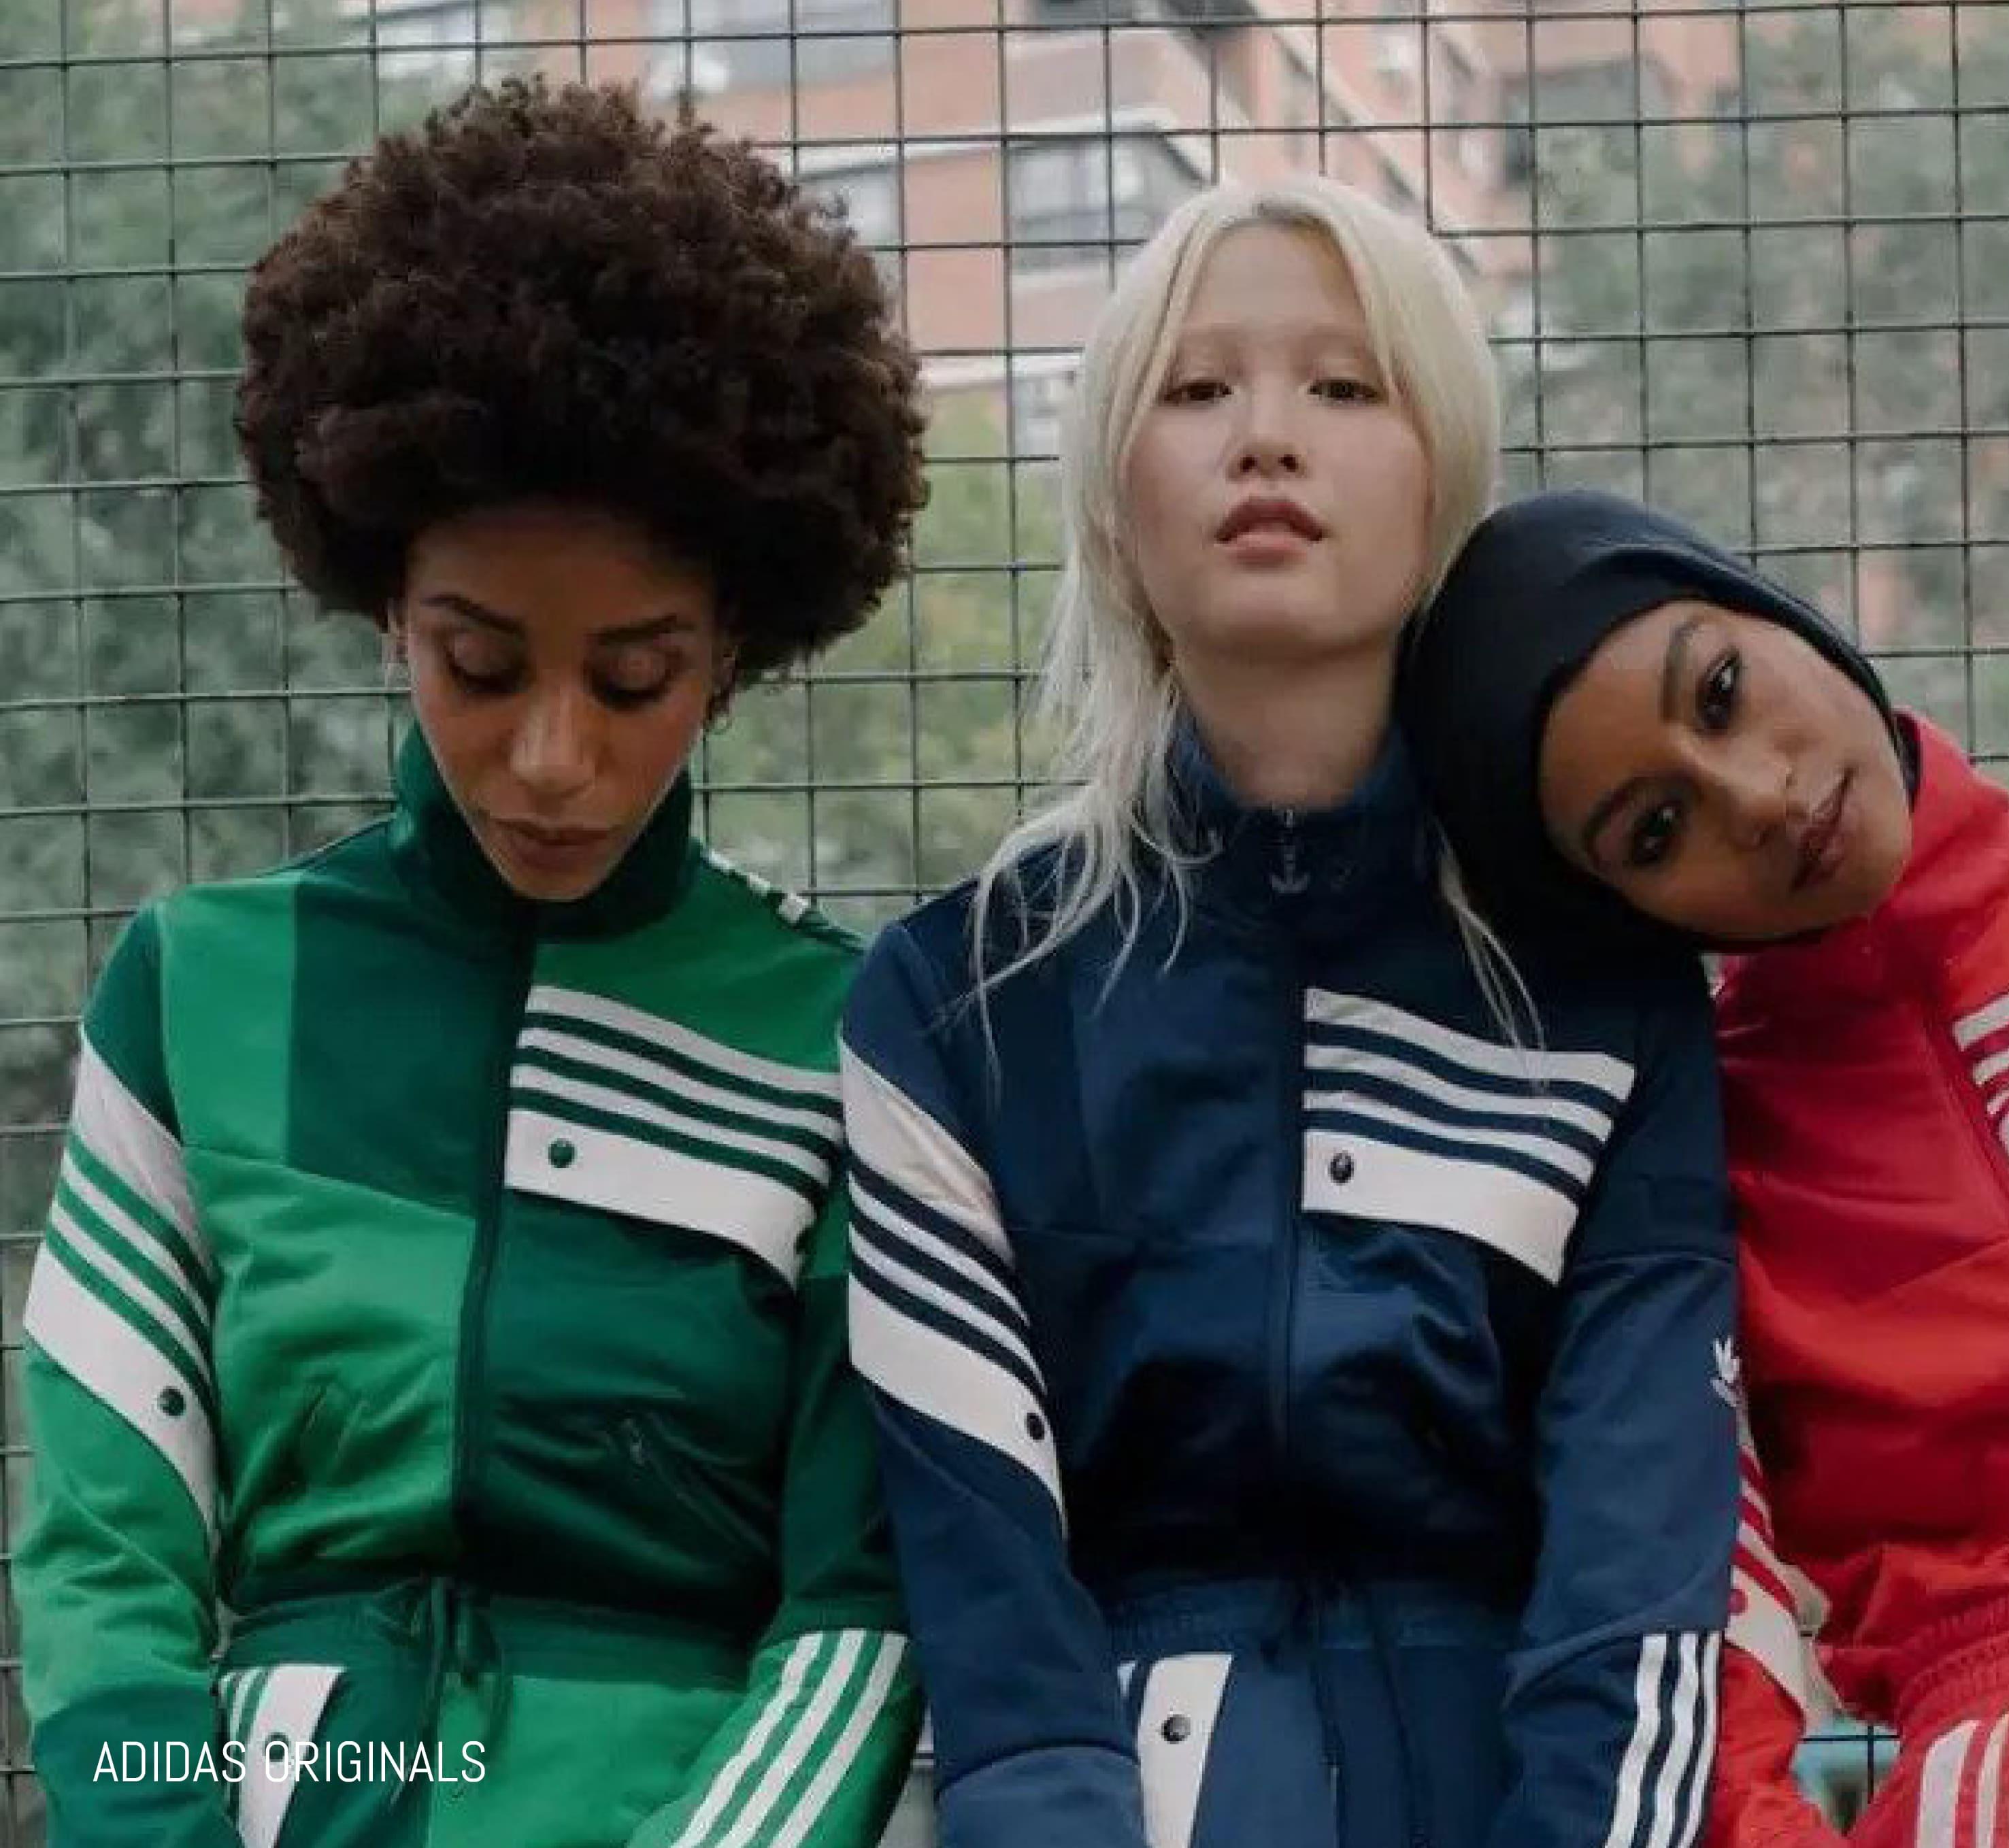 Gen Z models pose in Adidas Originals tracksuits